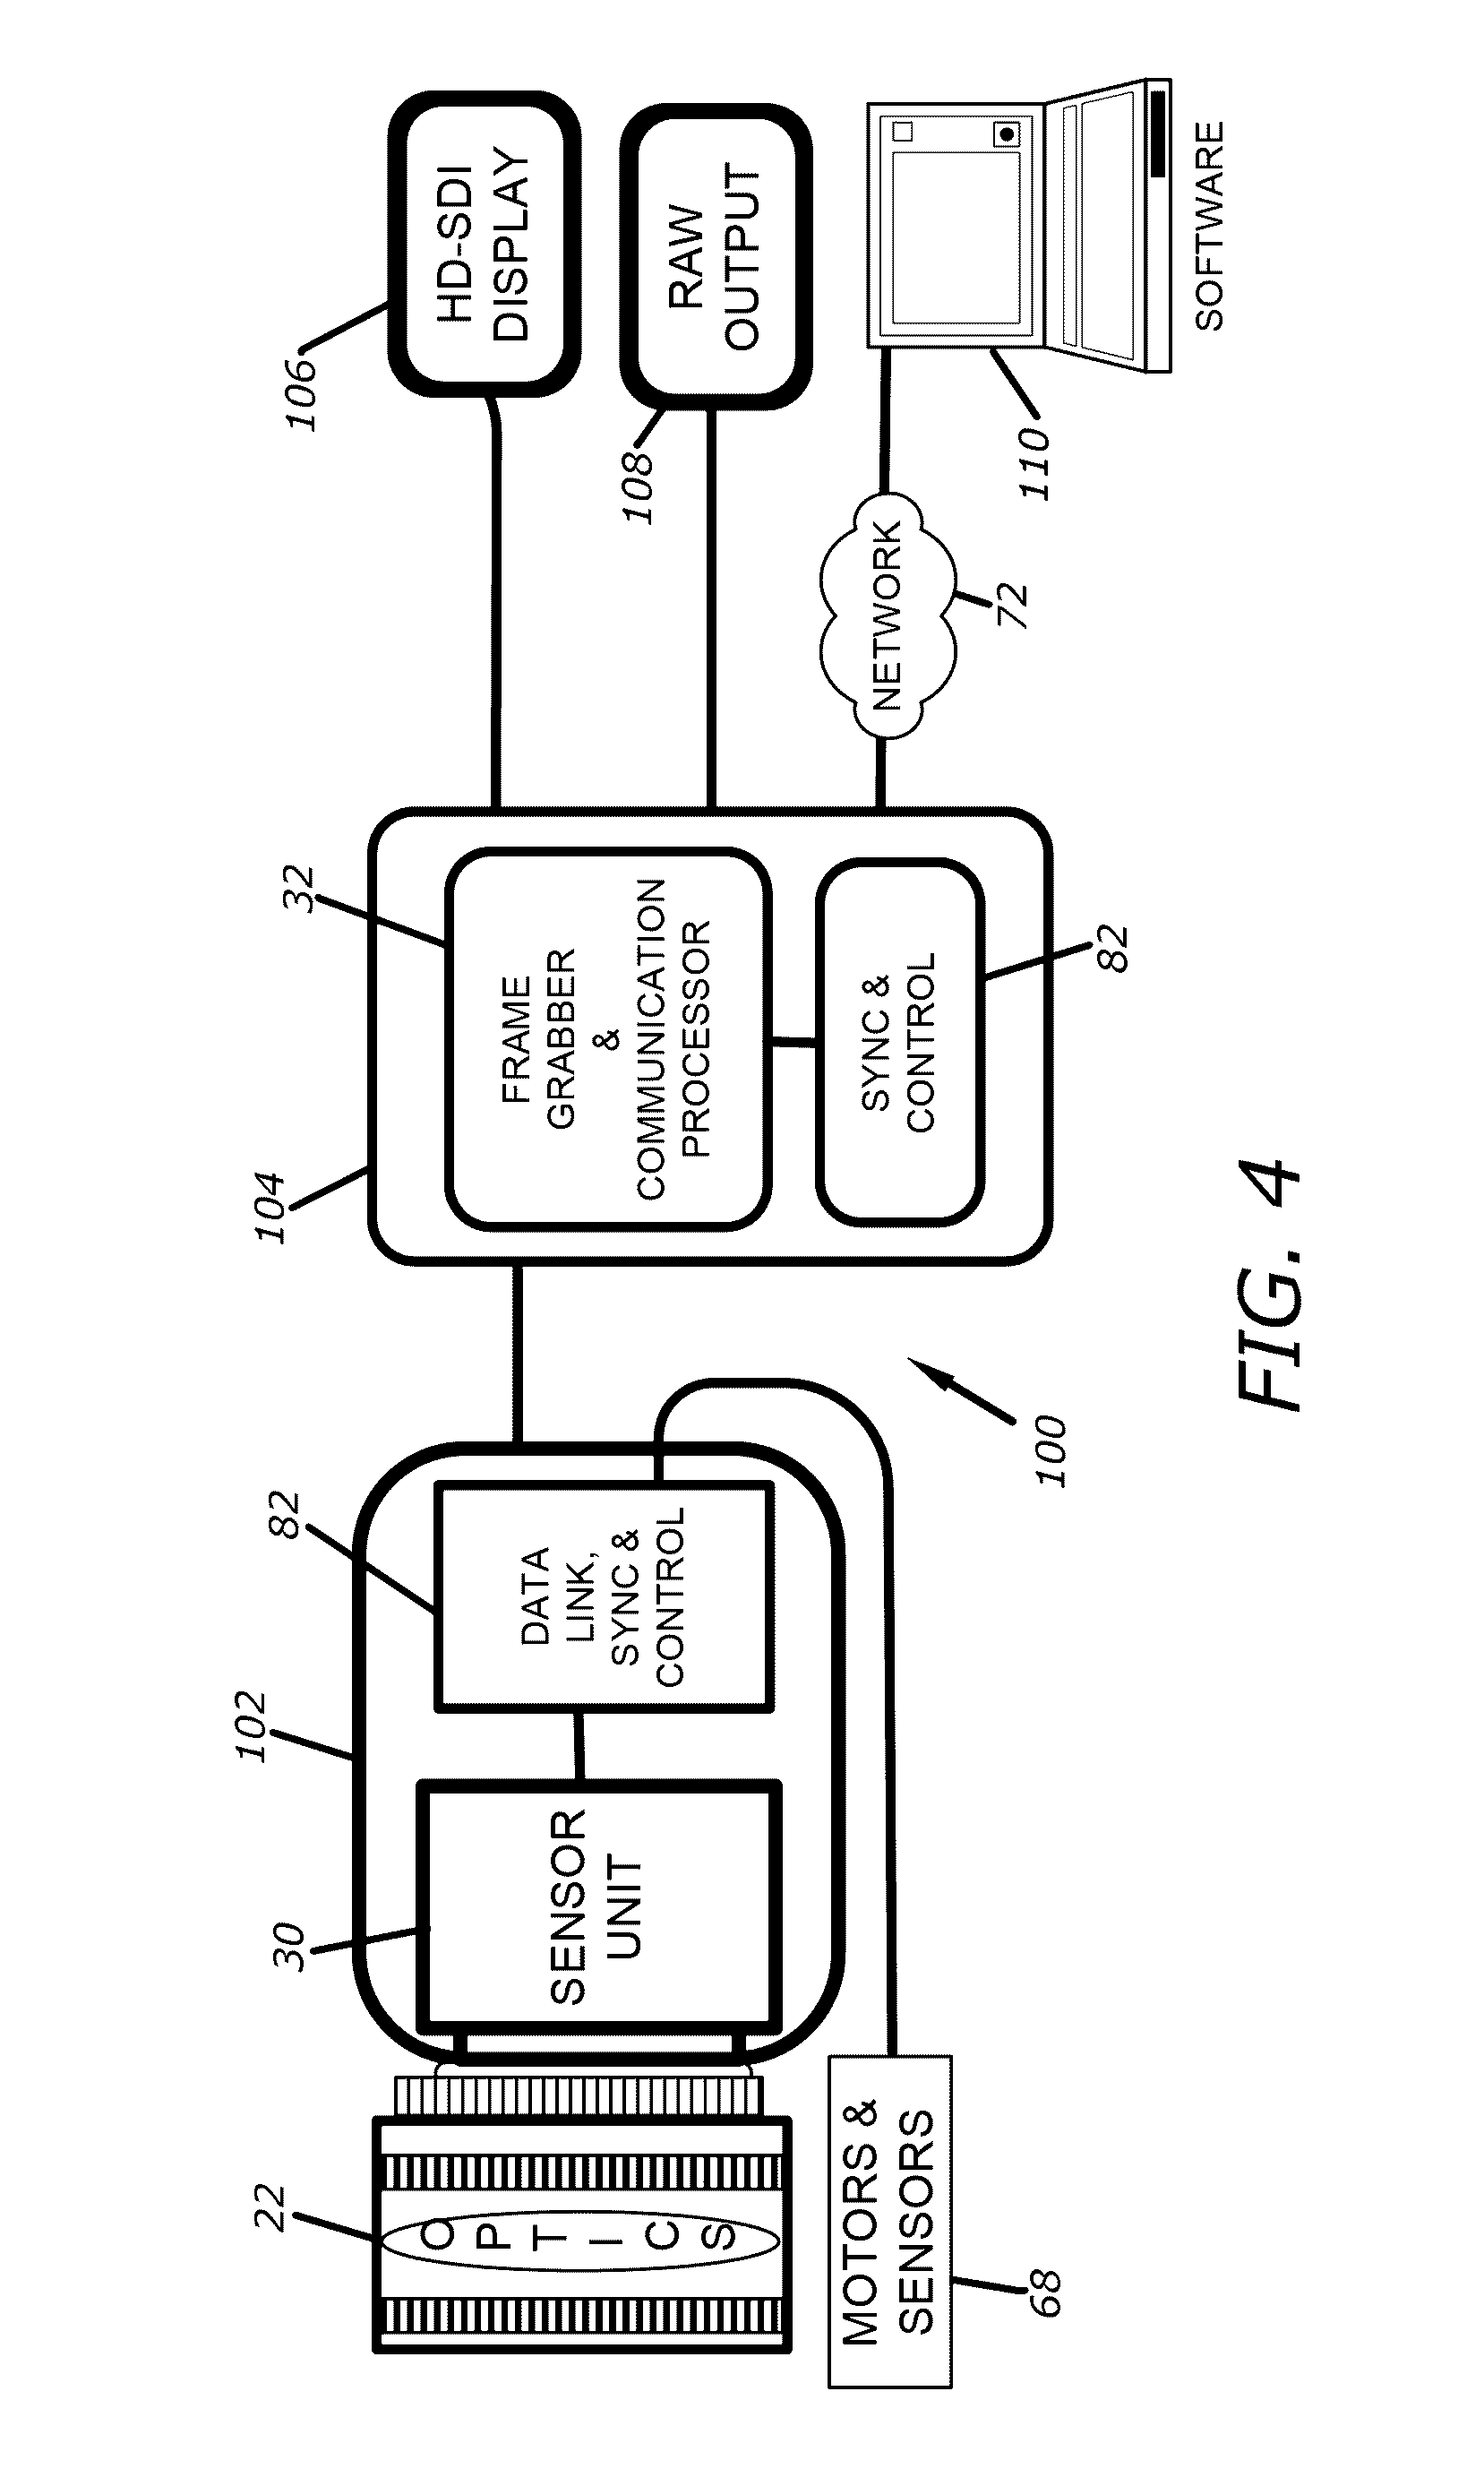 Patent Us 9565419 B2 Diagram Circuit Source Correct Color Alignment Making Cat5e